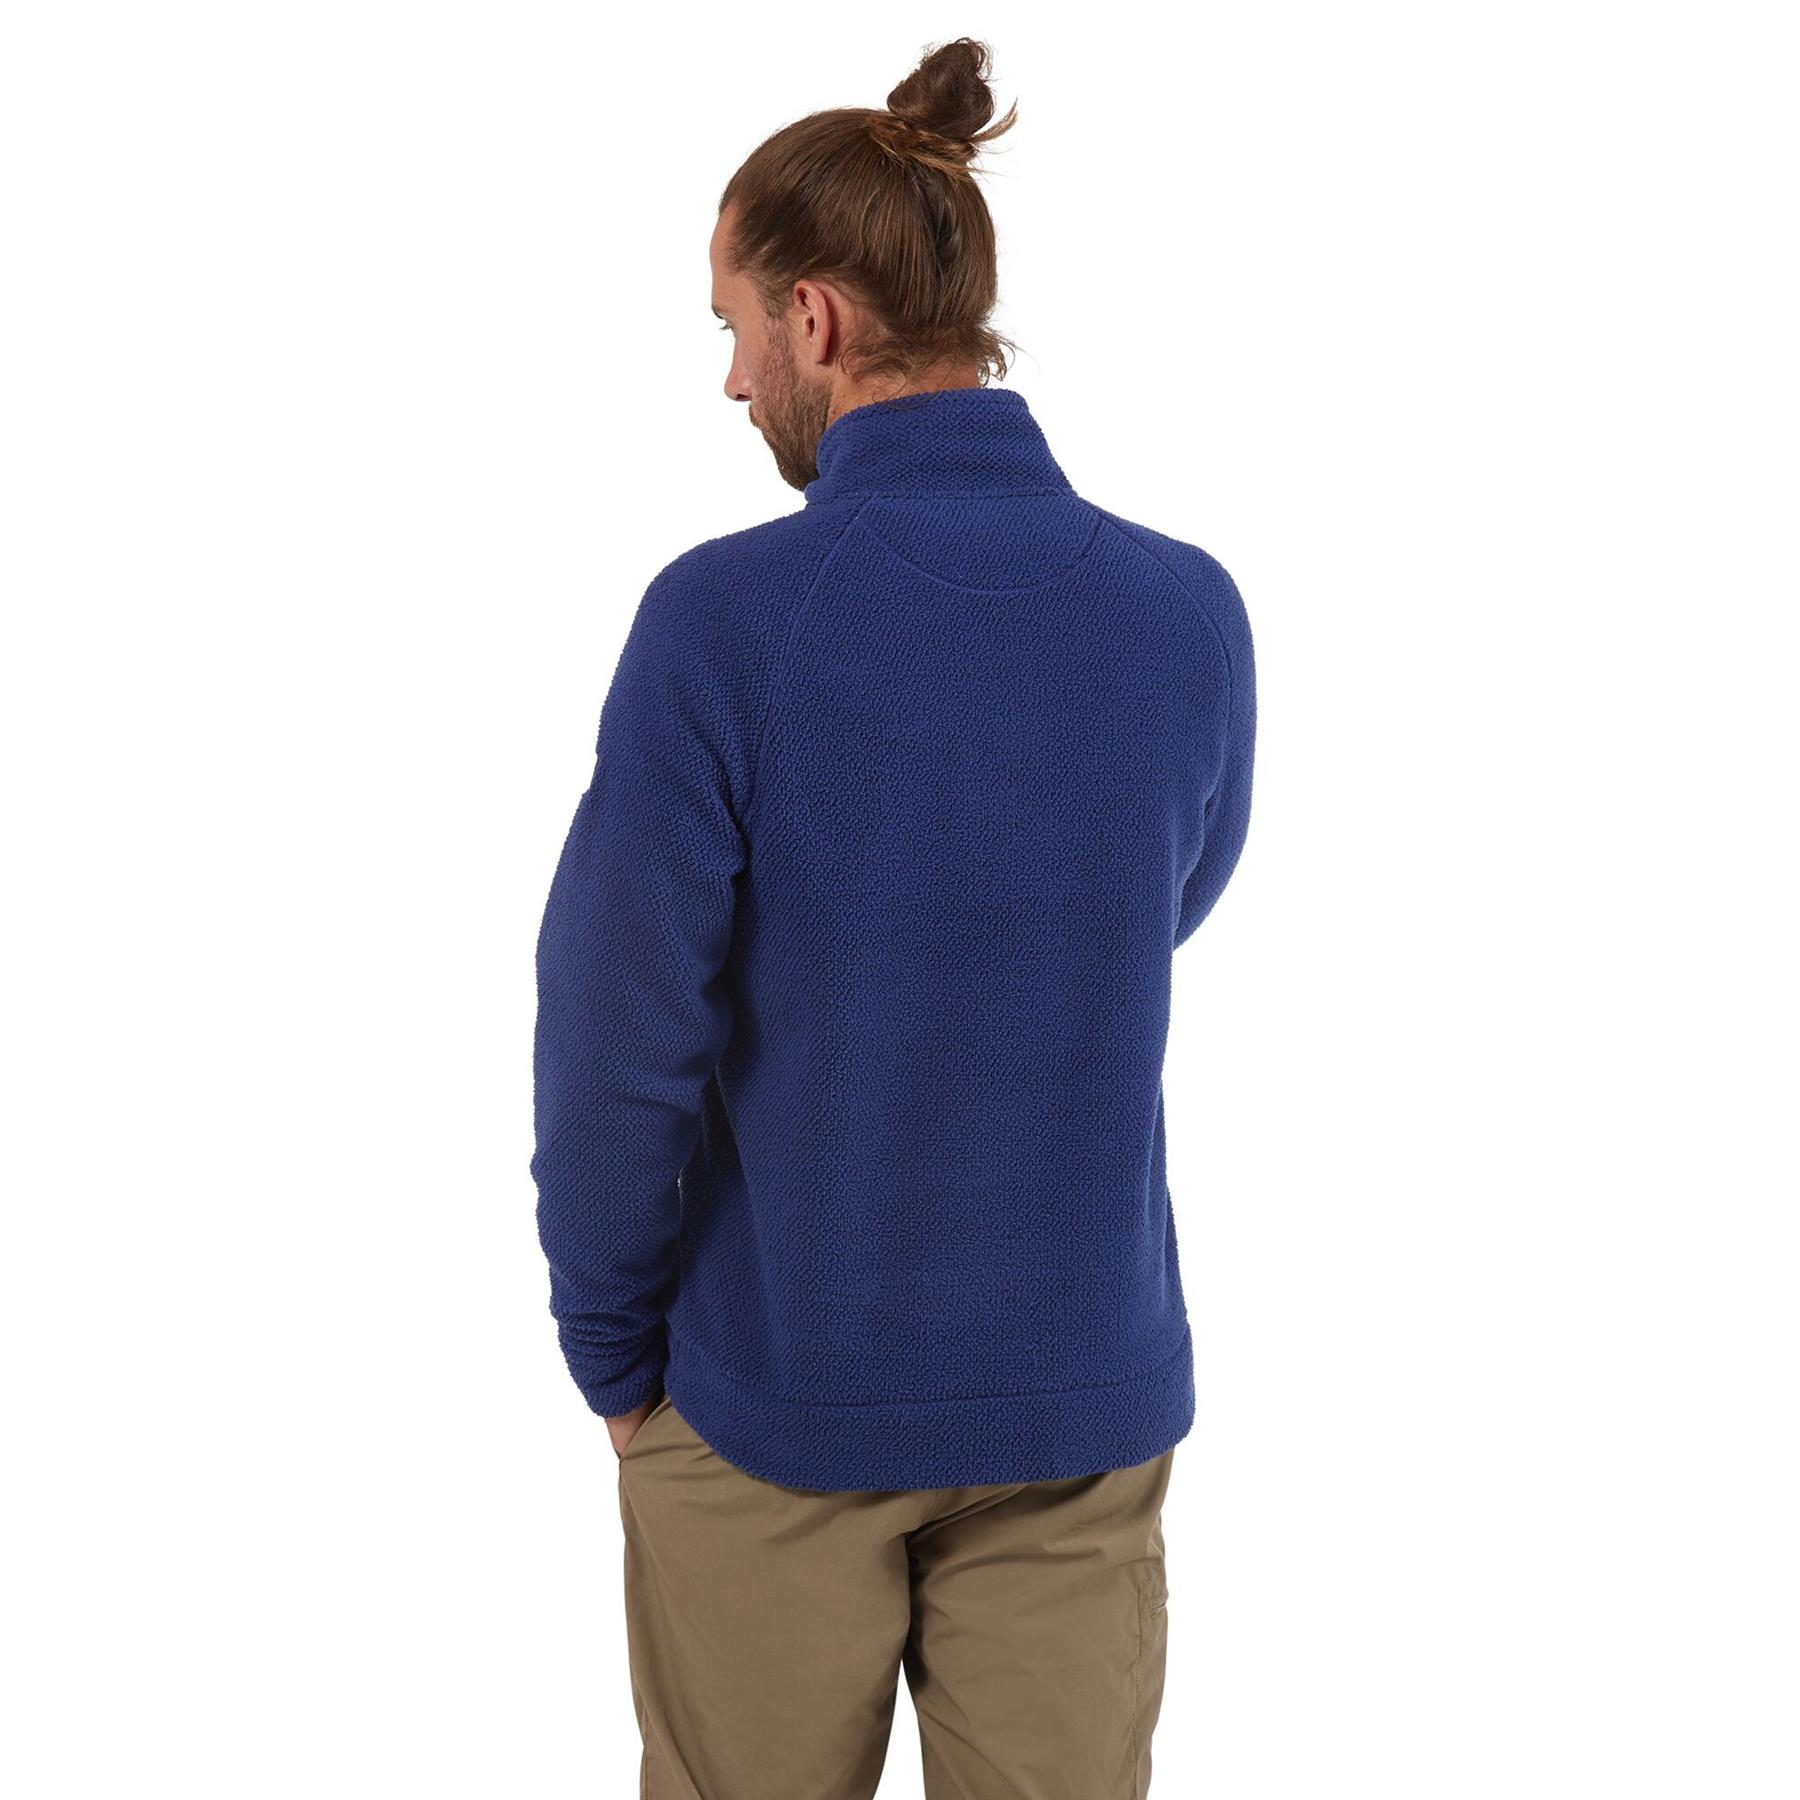 miniatuur 11 - Craghopper Mens Cason Fleece Half Zip Bobble Soft Jumper Pullover Sweater